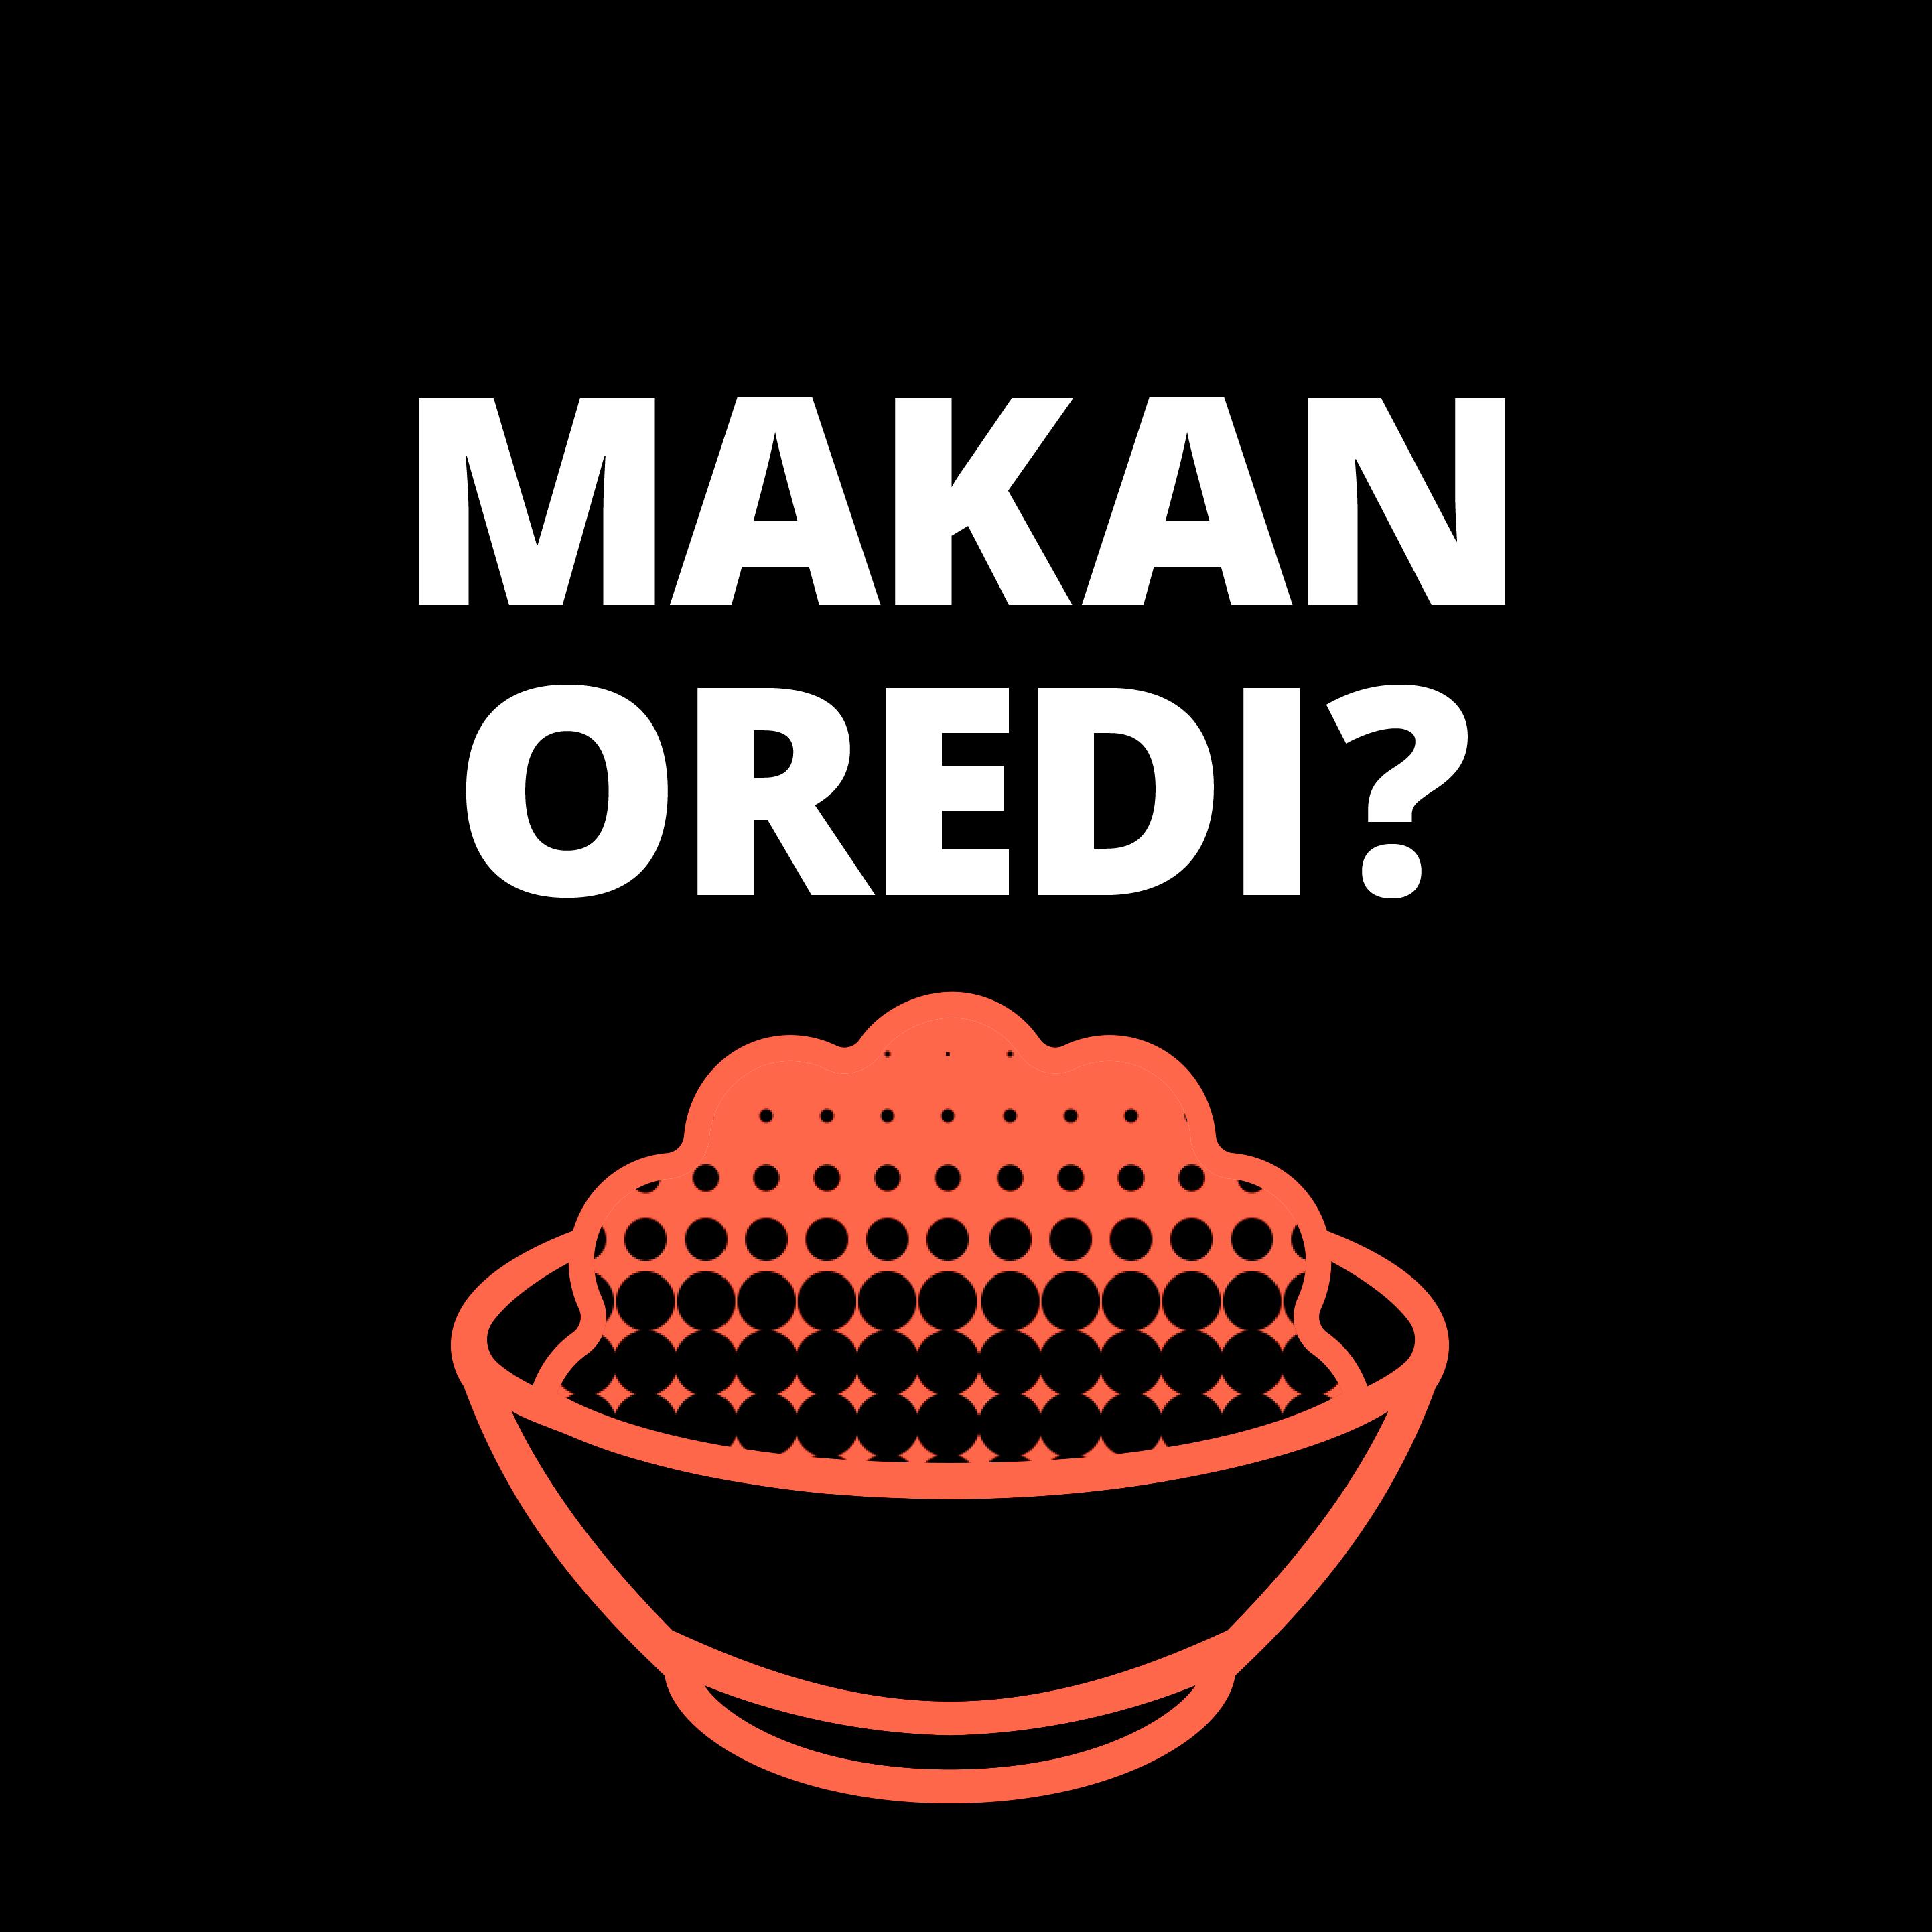 MakanOredi